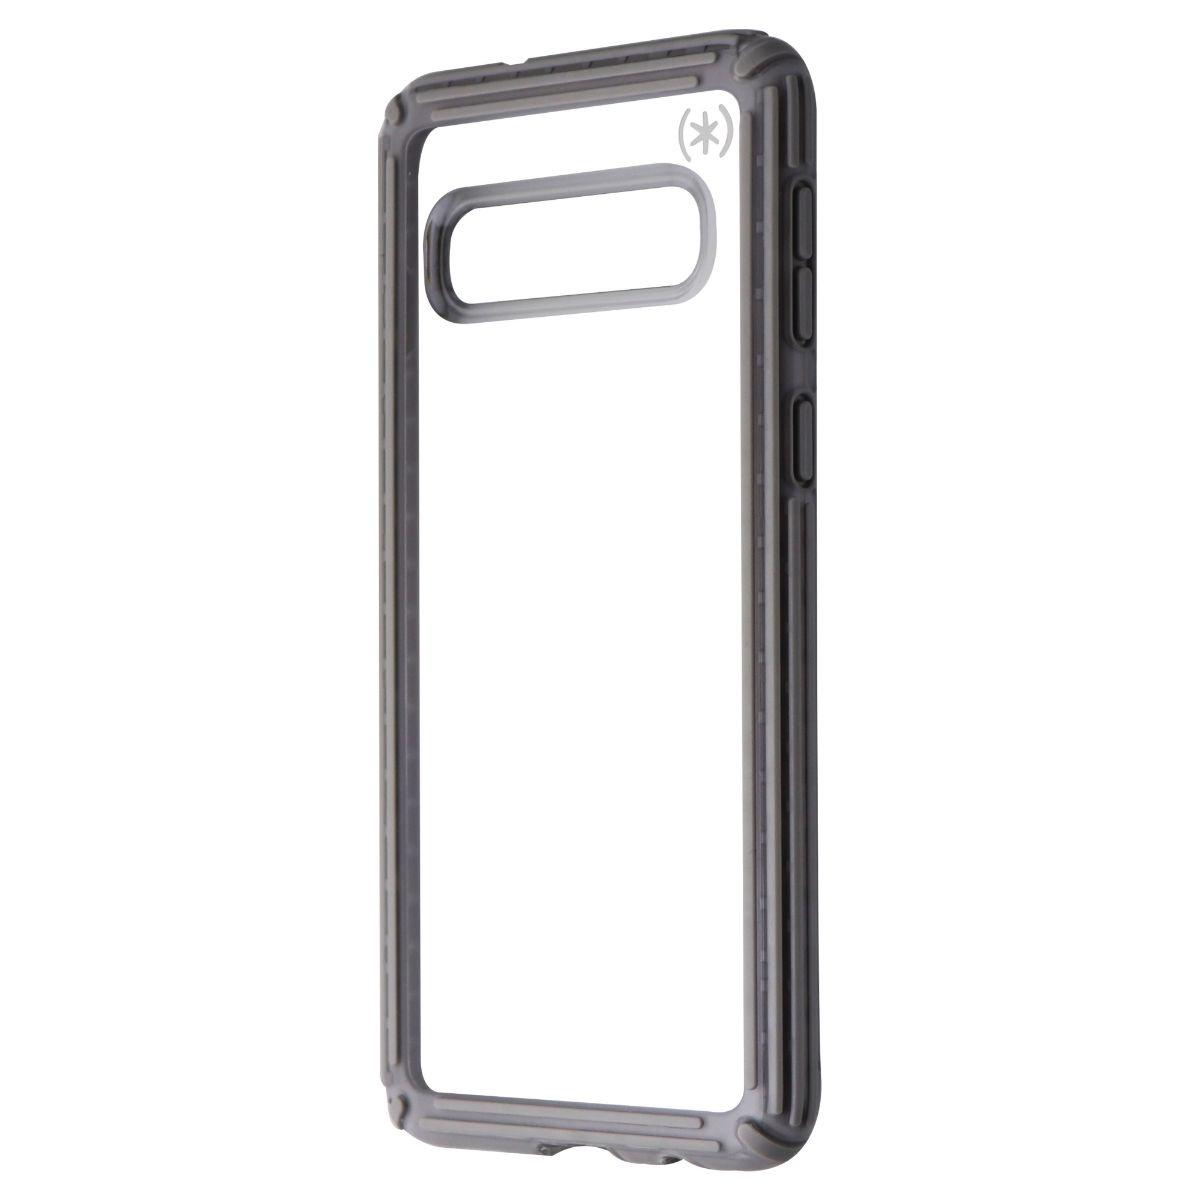 Speck Presidio V-Grip Series Case for Samsung Galaxy S10 - Clear / Gray